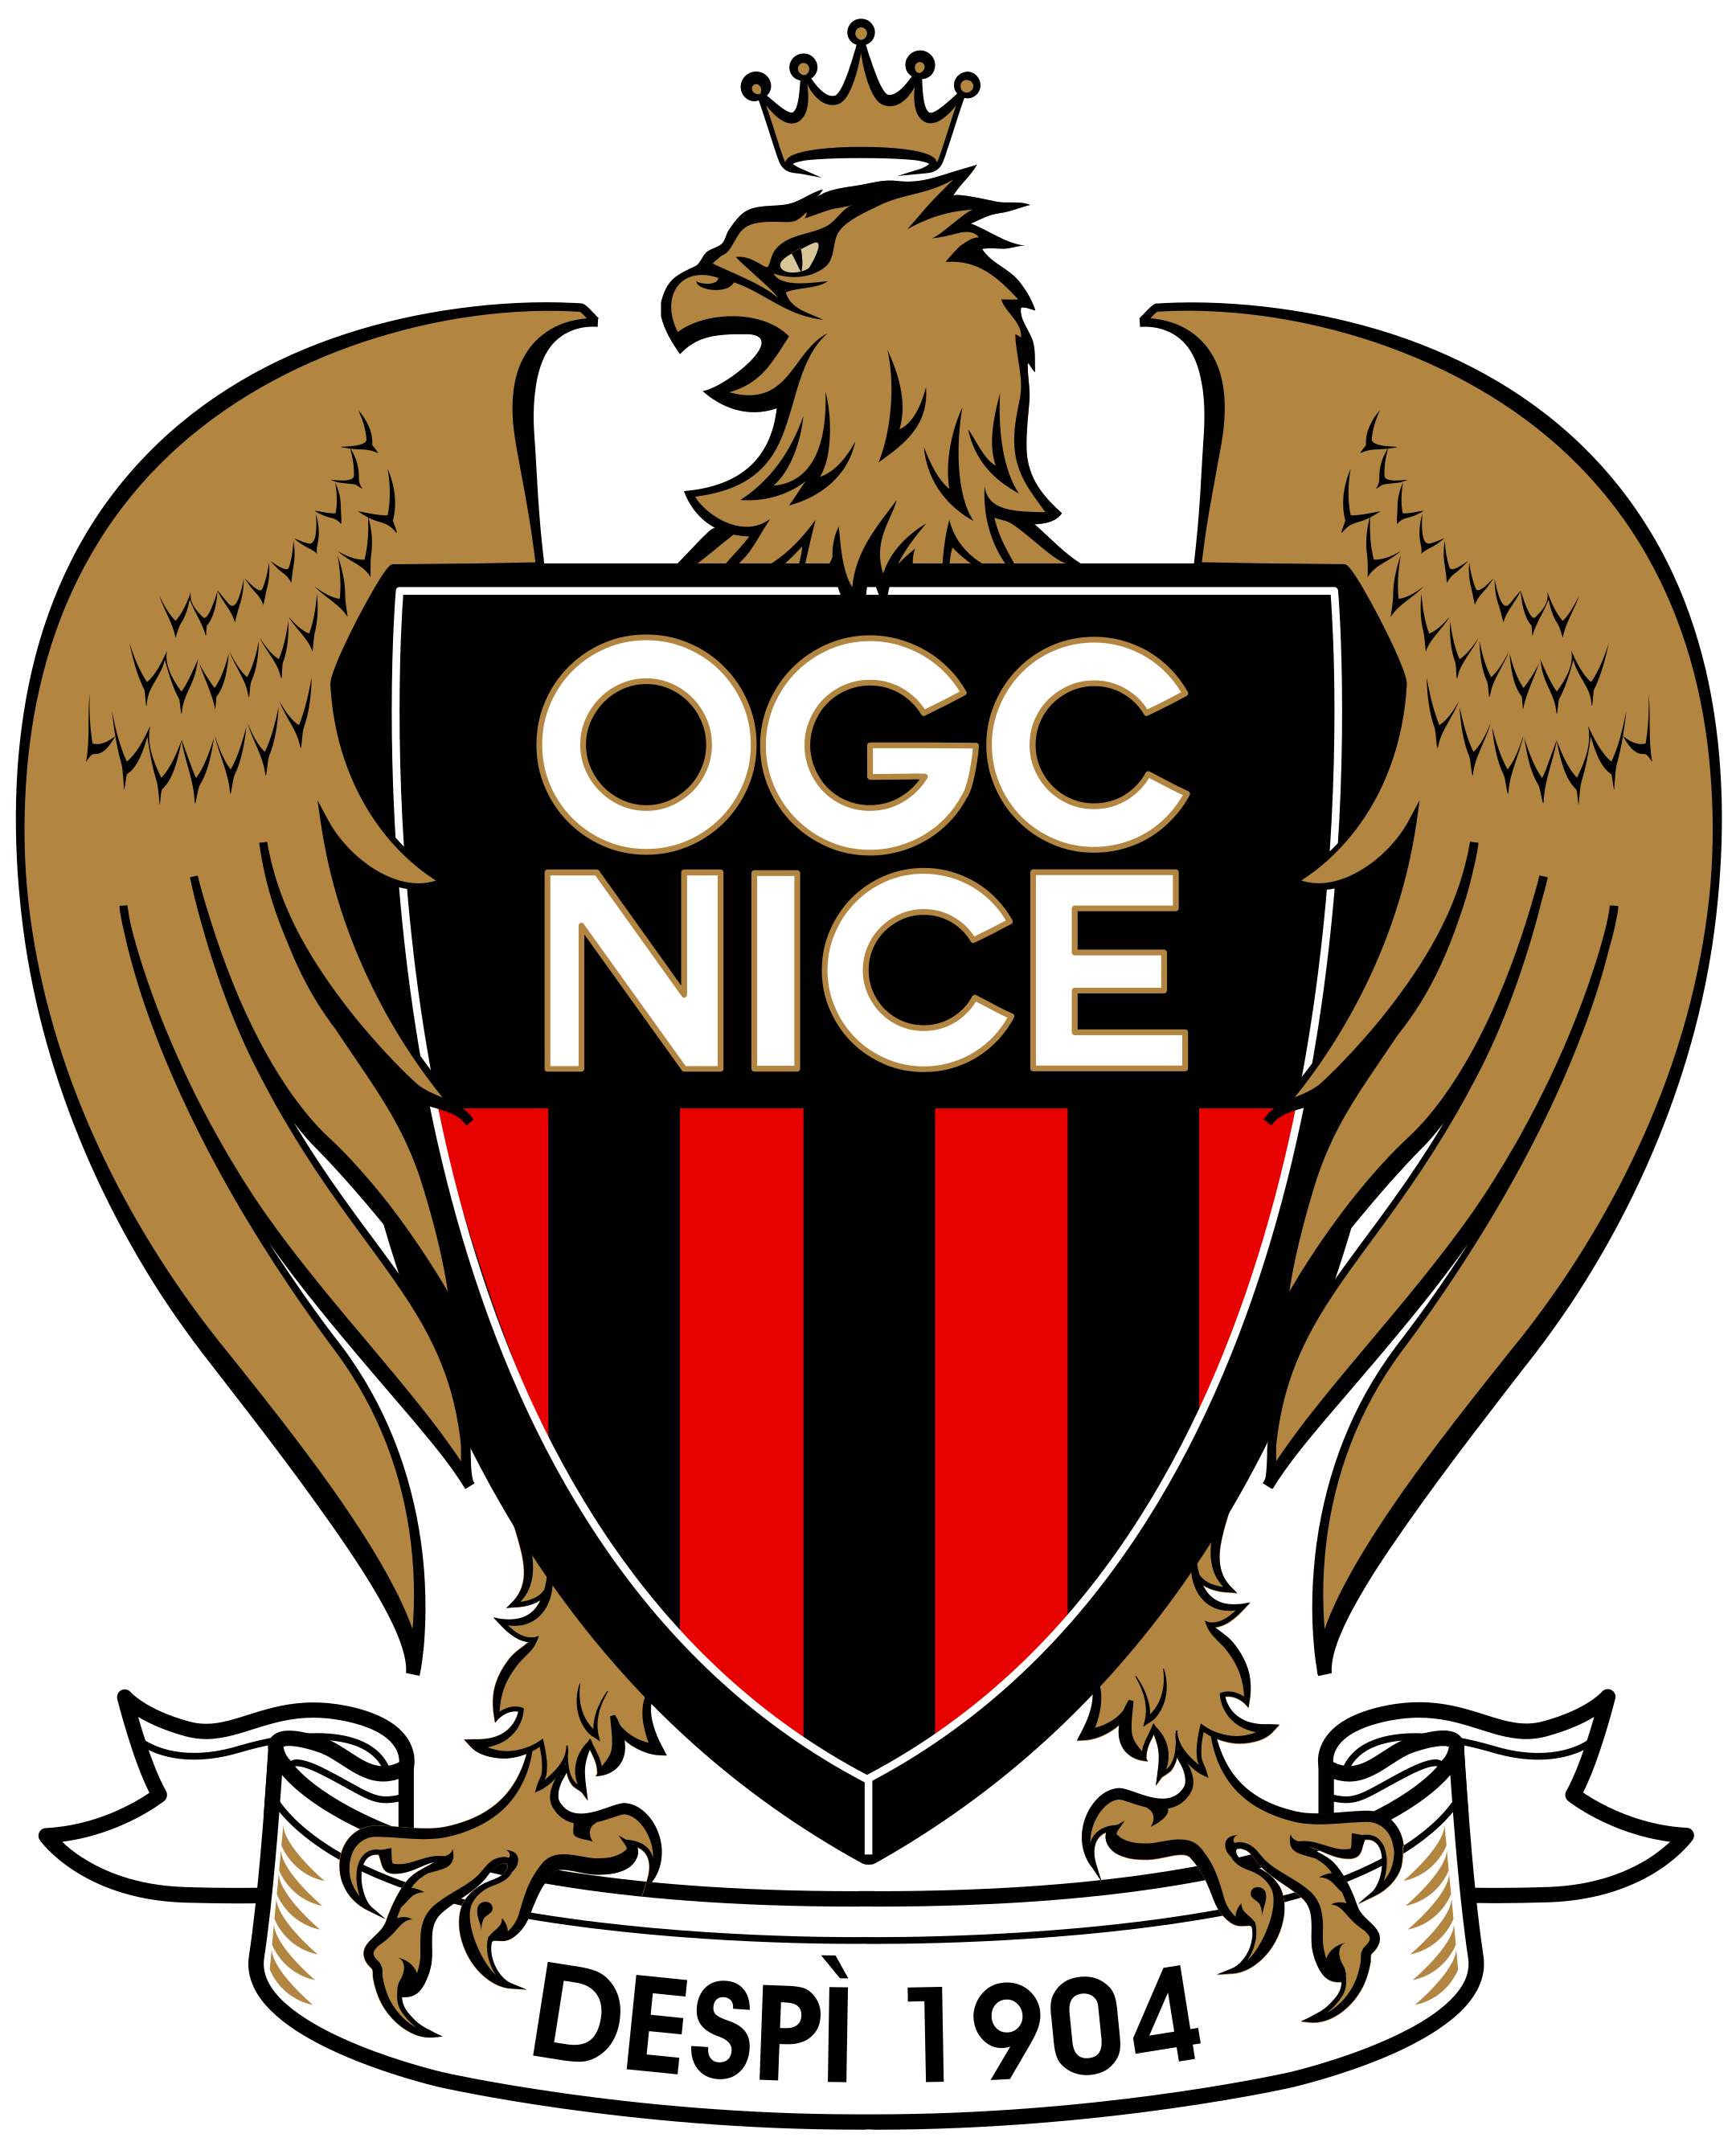 ogc-nice-logo-1